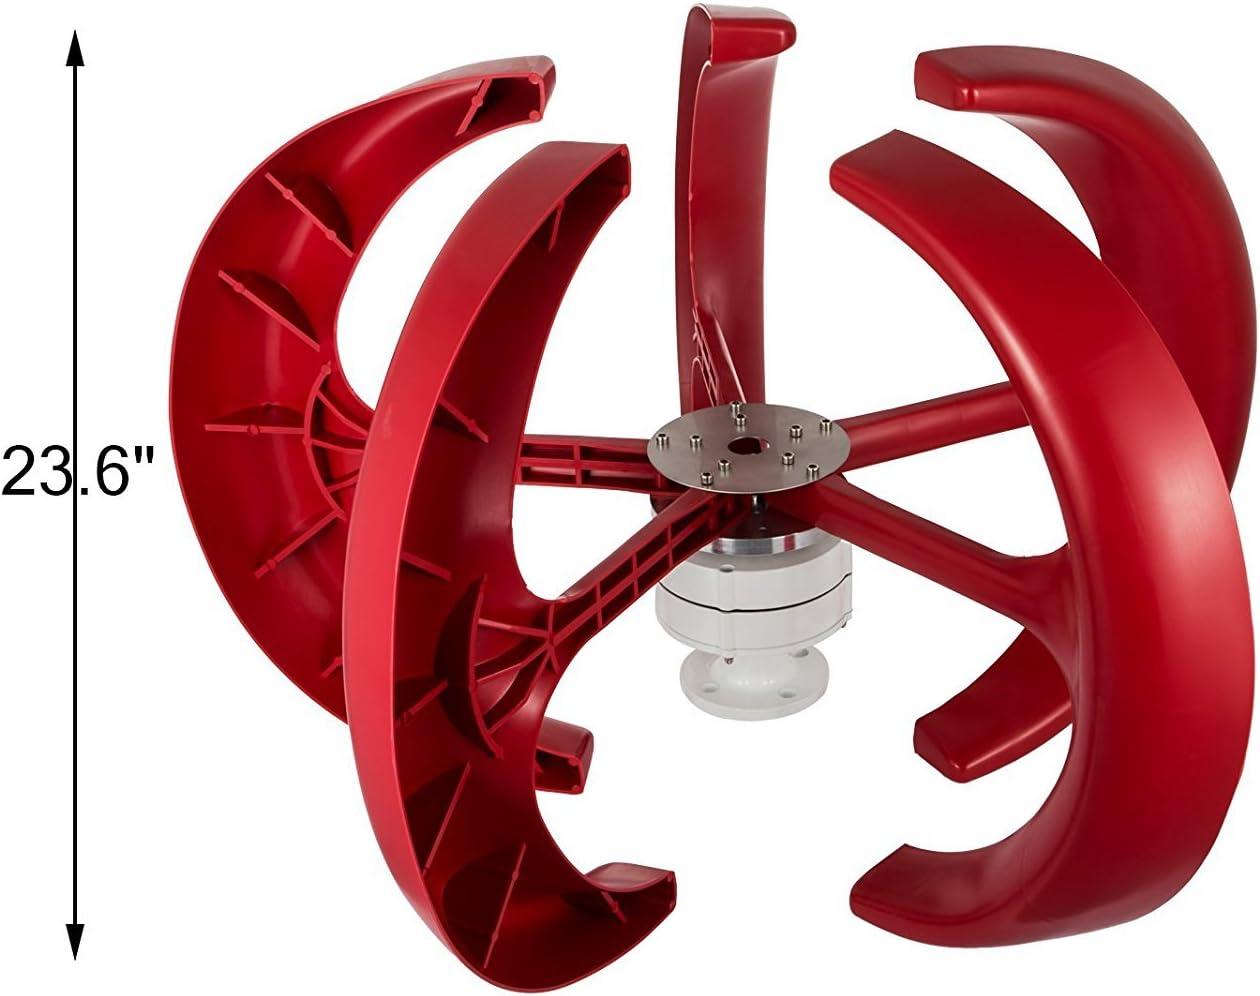 AYNEFY Wind Turbines,Windkraftanlage 12V 3-Blatt-Windturbinengenerator-Kit zur Stromerzeugung